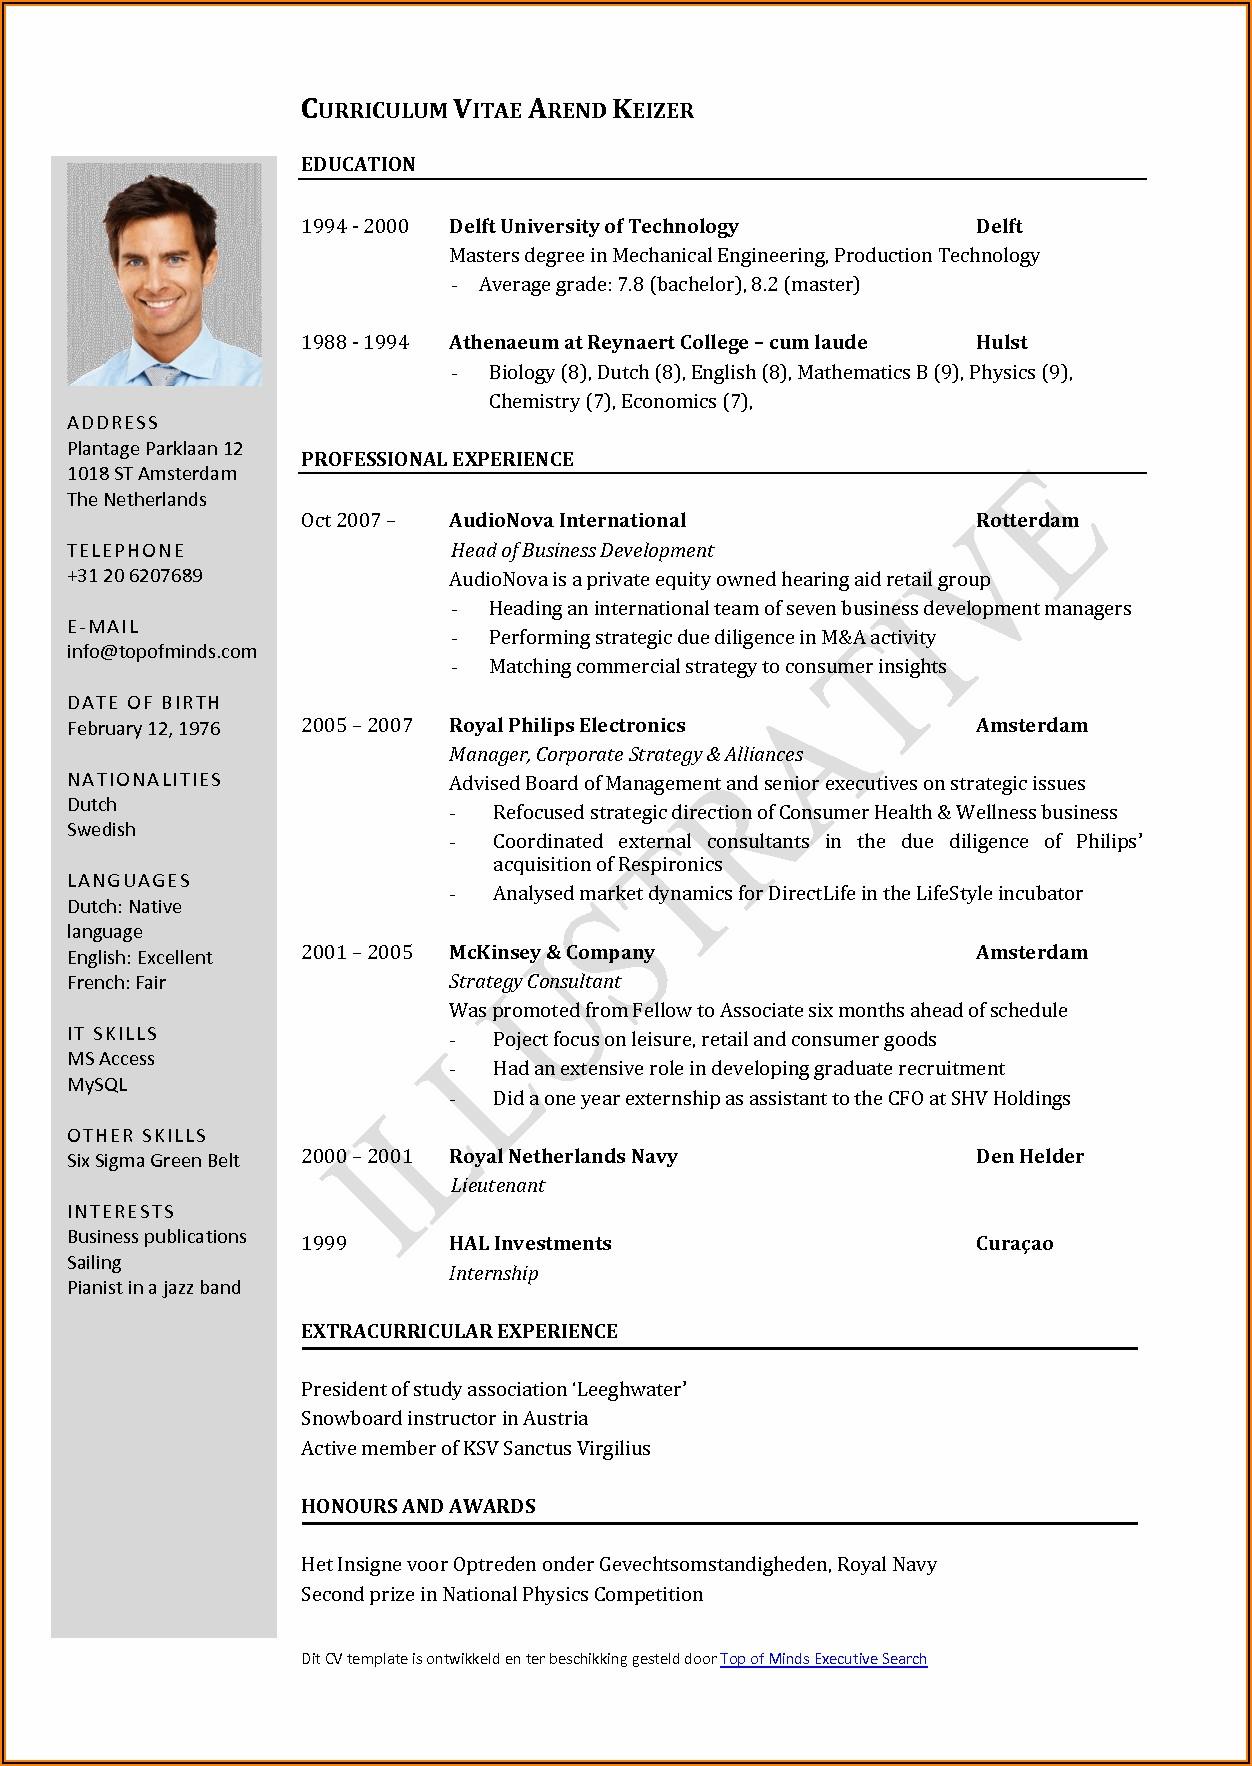 Sample Job Application Forms Free Download